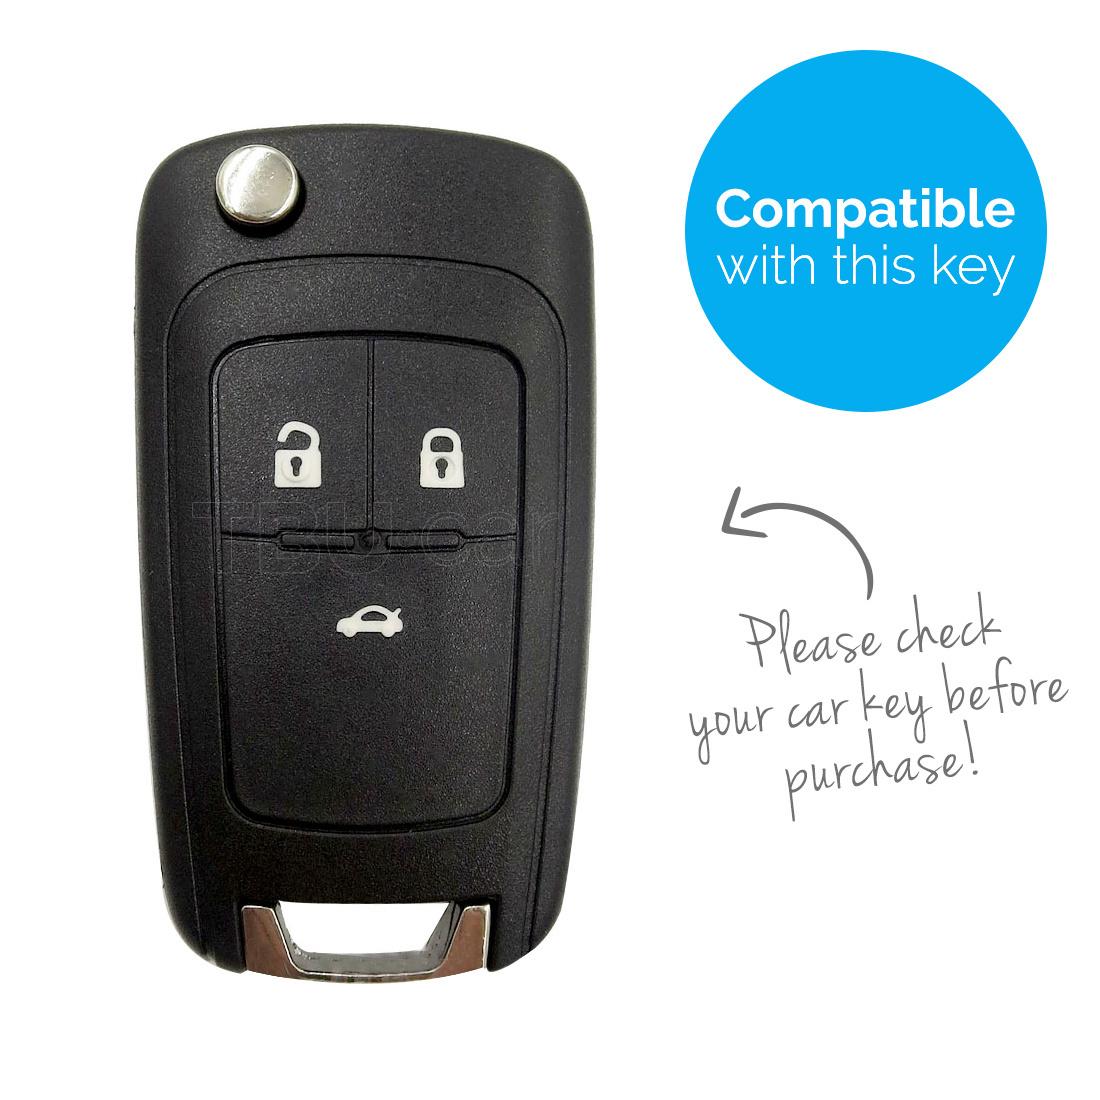 TBU car TBU car Autoschlüssel Hülle kompatibel mit Vauxhall 3 Tasten - Schutzhülle aus Silikon - Auto Schlüsselhülle Cover in Weiß